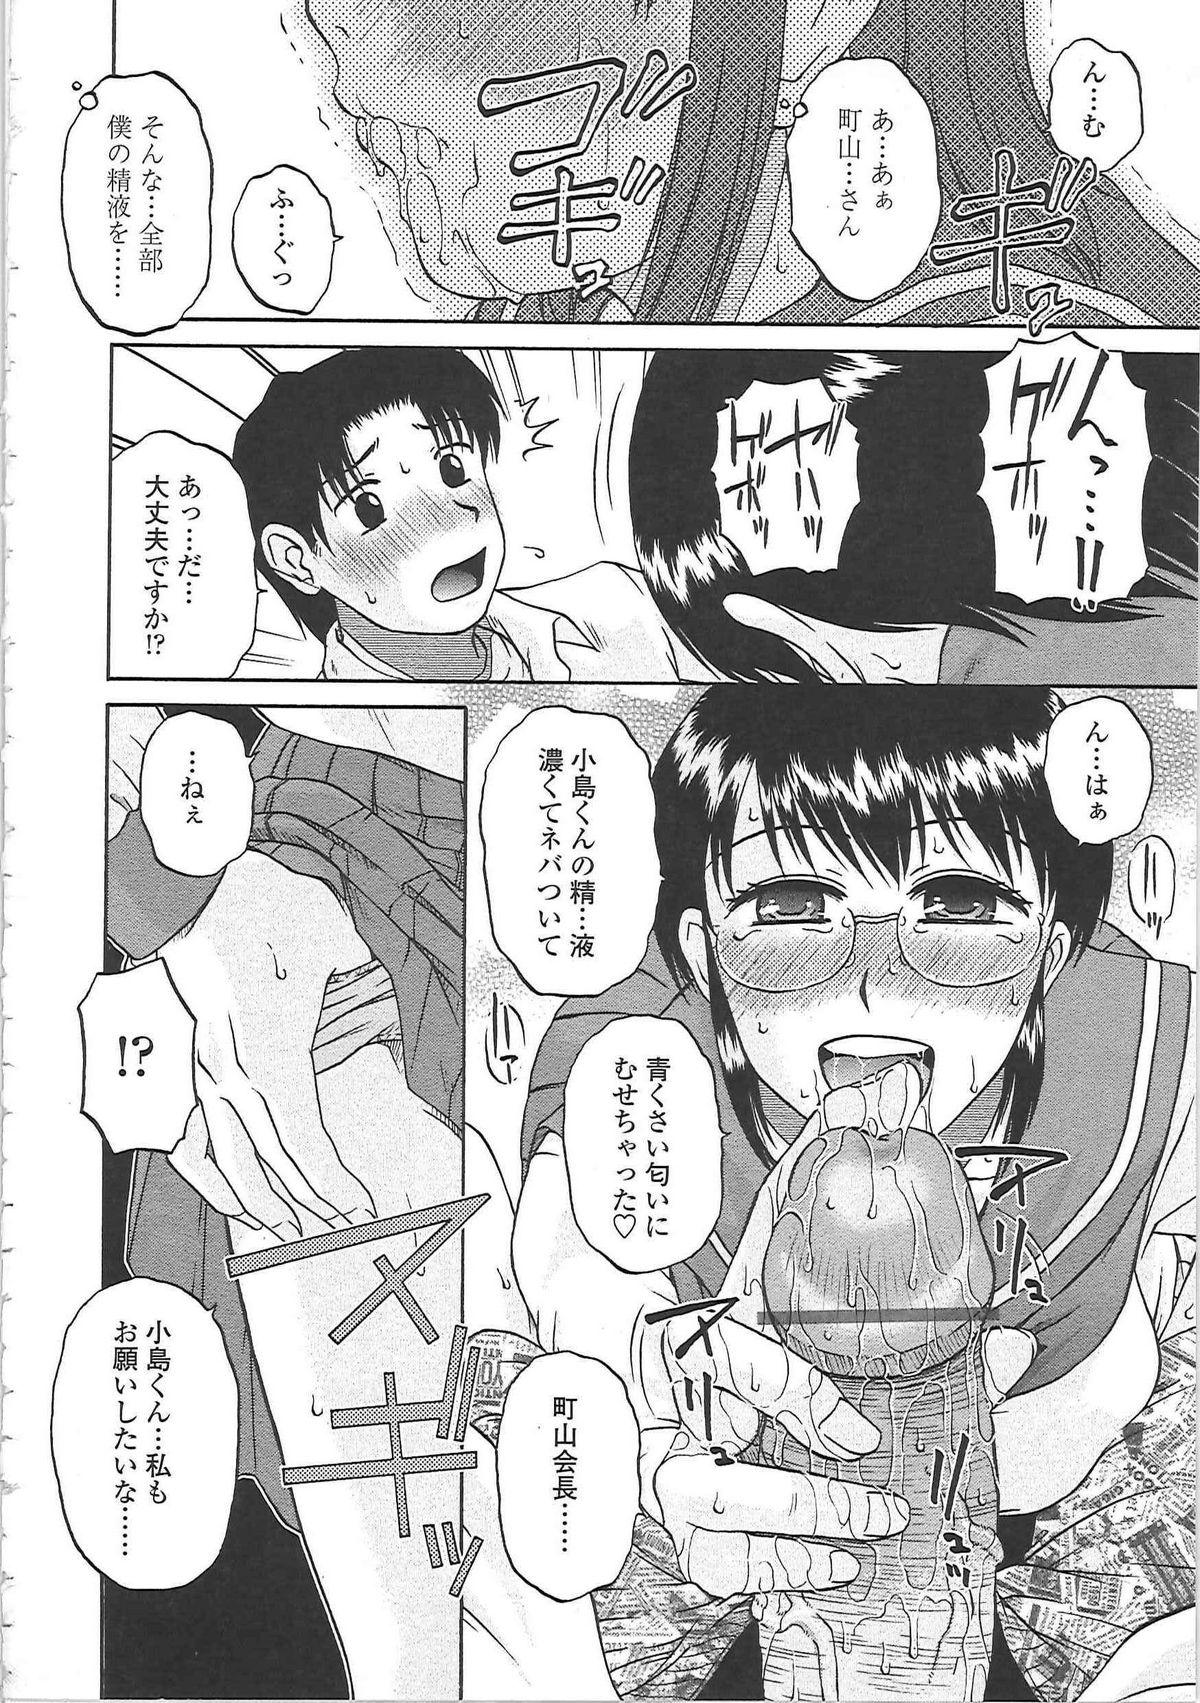 Nikuzuma Tsuushin - Erotic Wife Communication 86